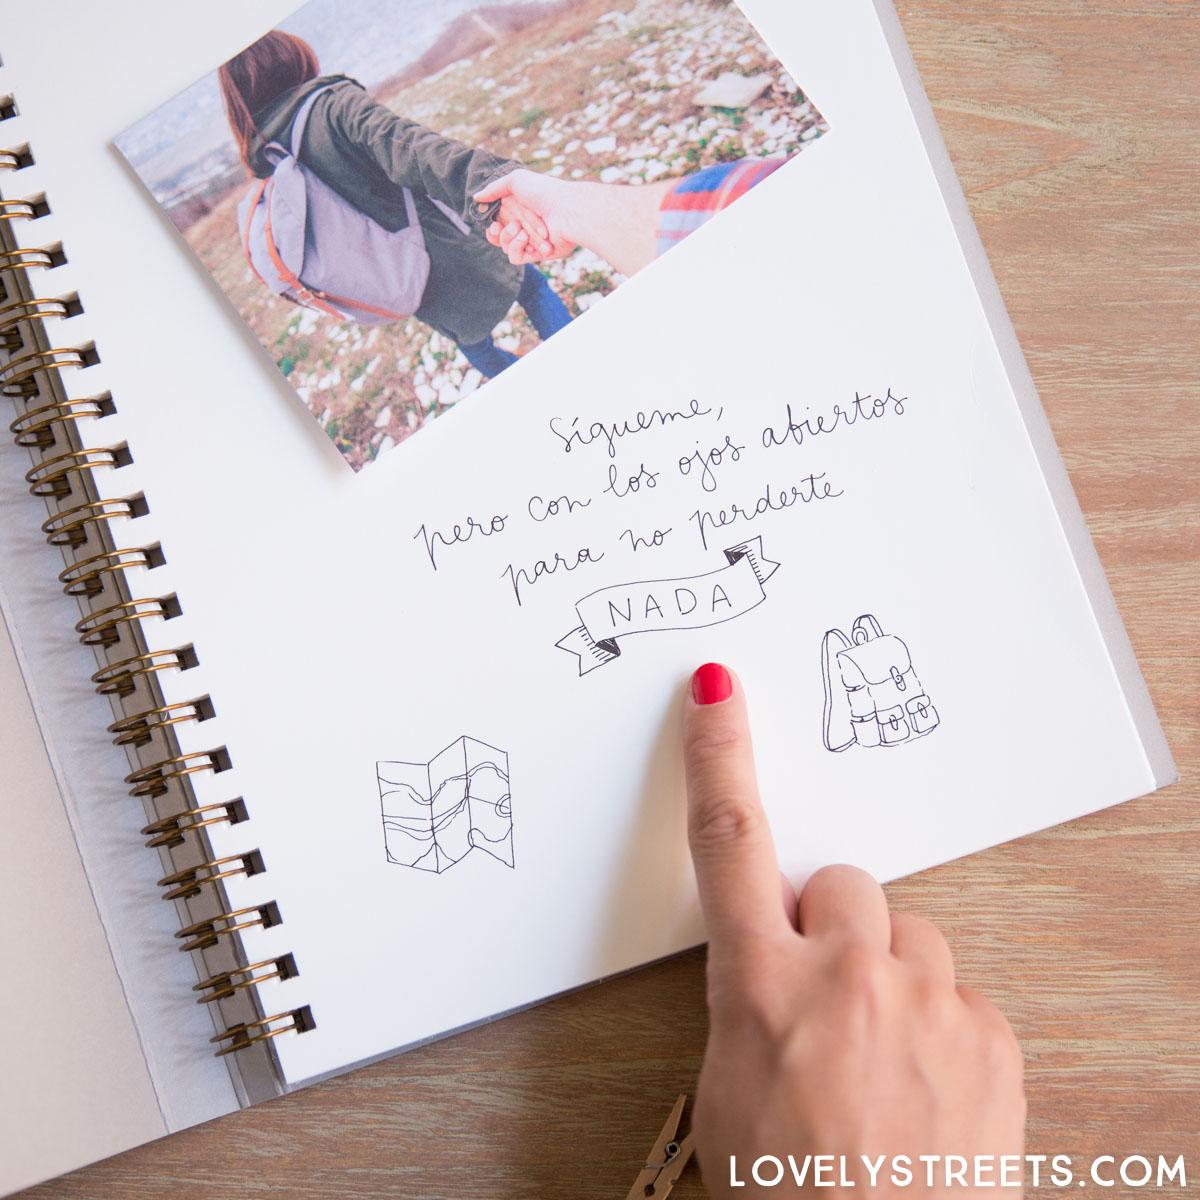 lovelystreets_8435439301282_album-aventuras-49-Editar